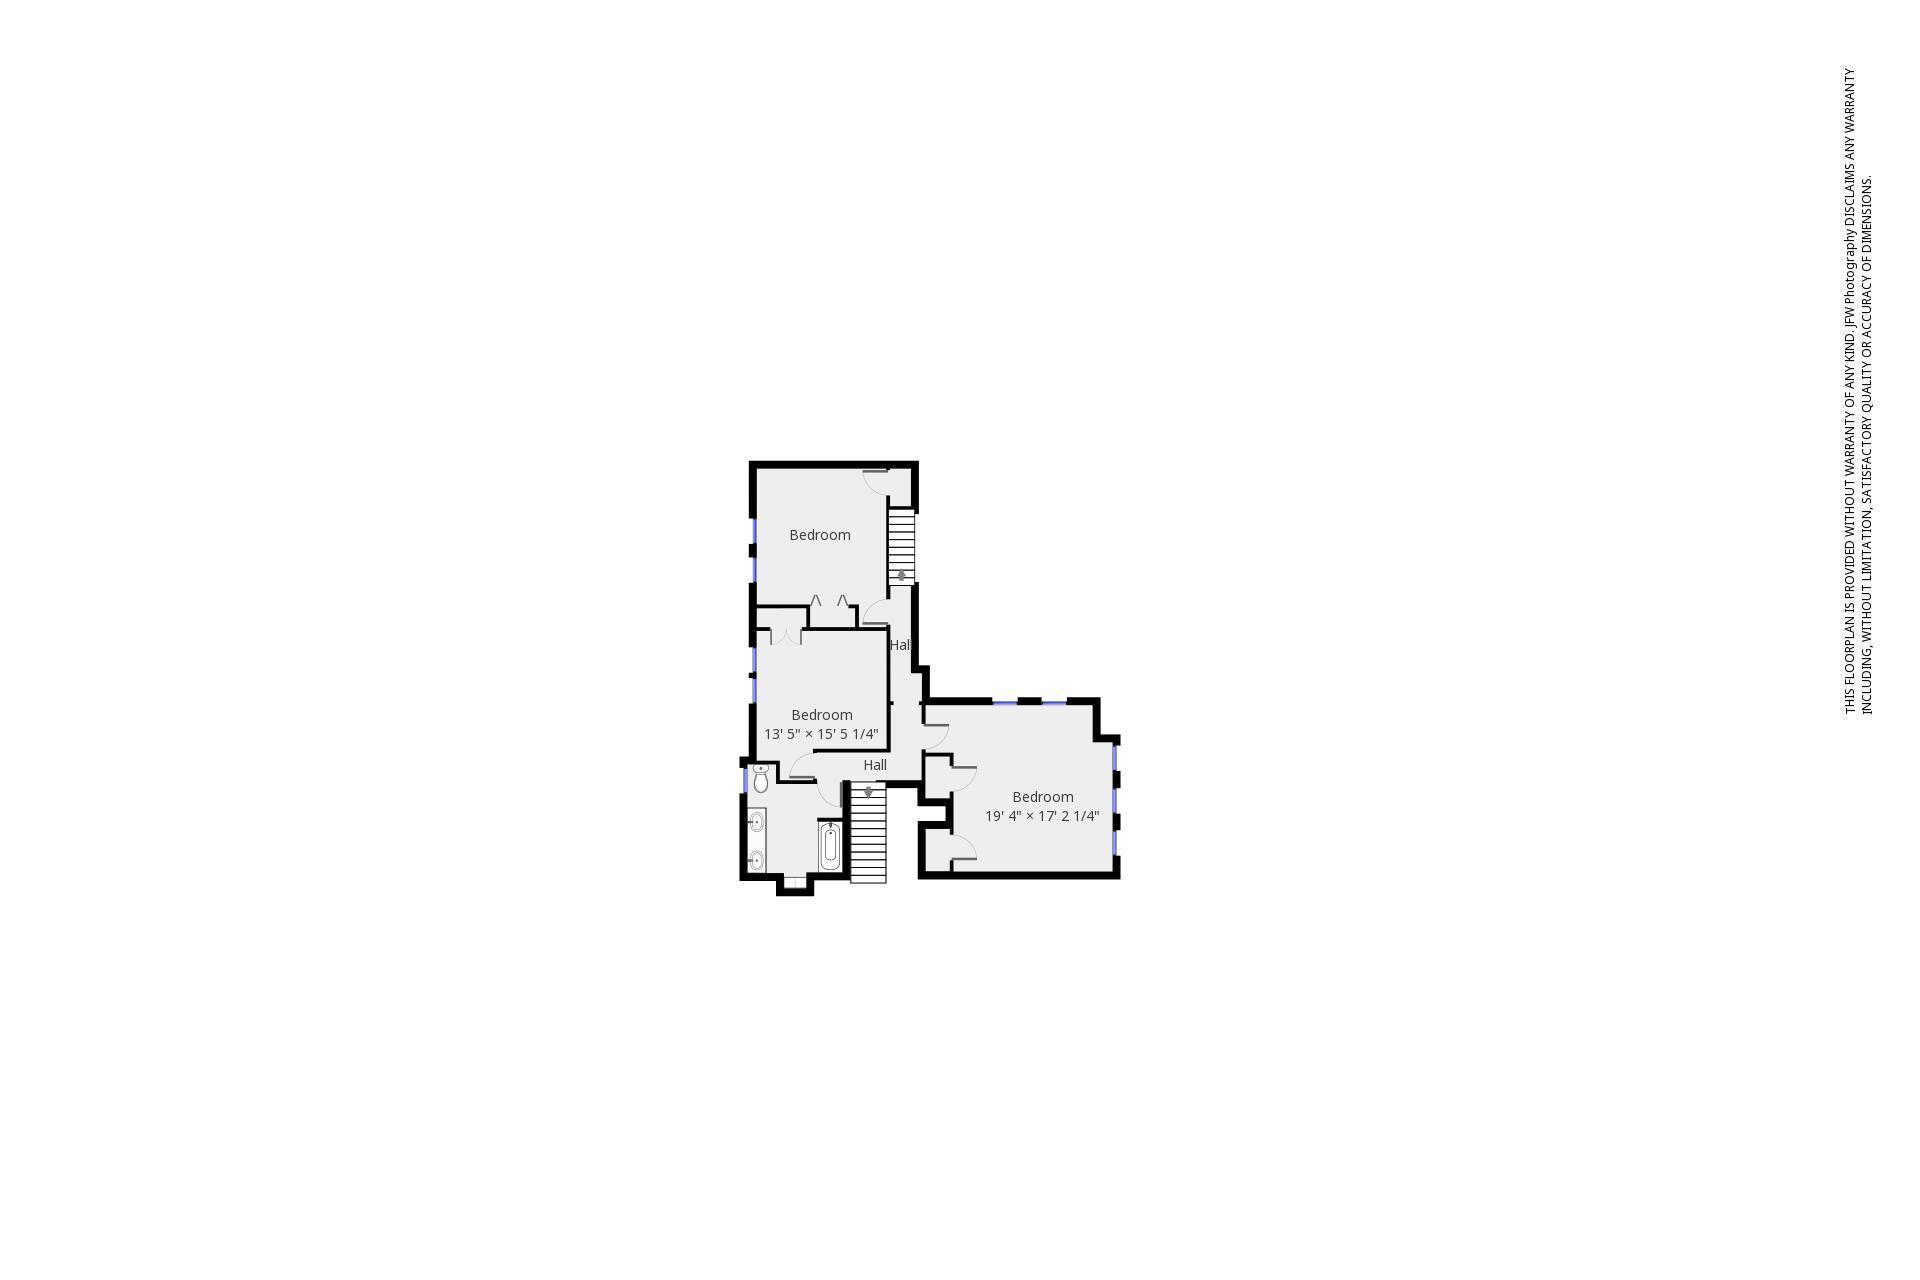 634 main street brewster ma 02631 property image 52